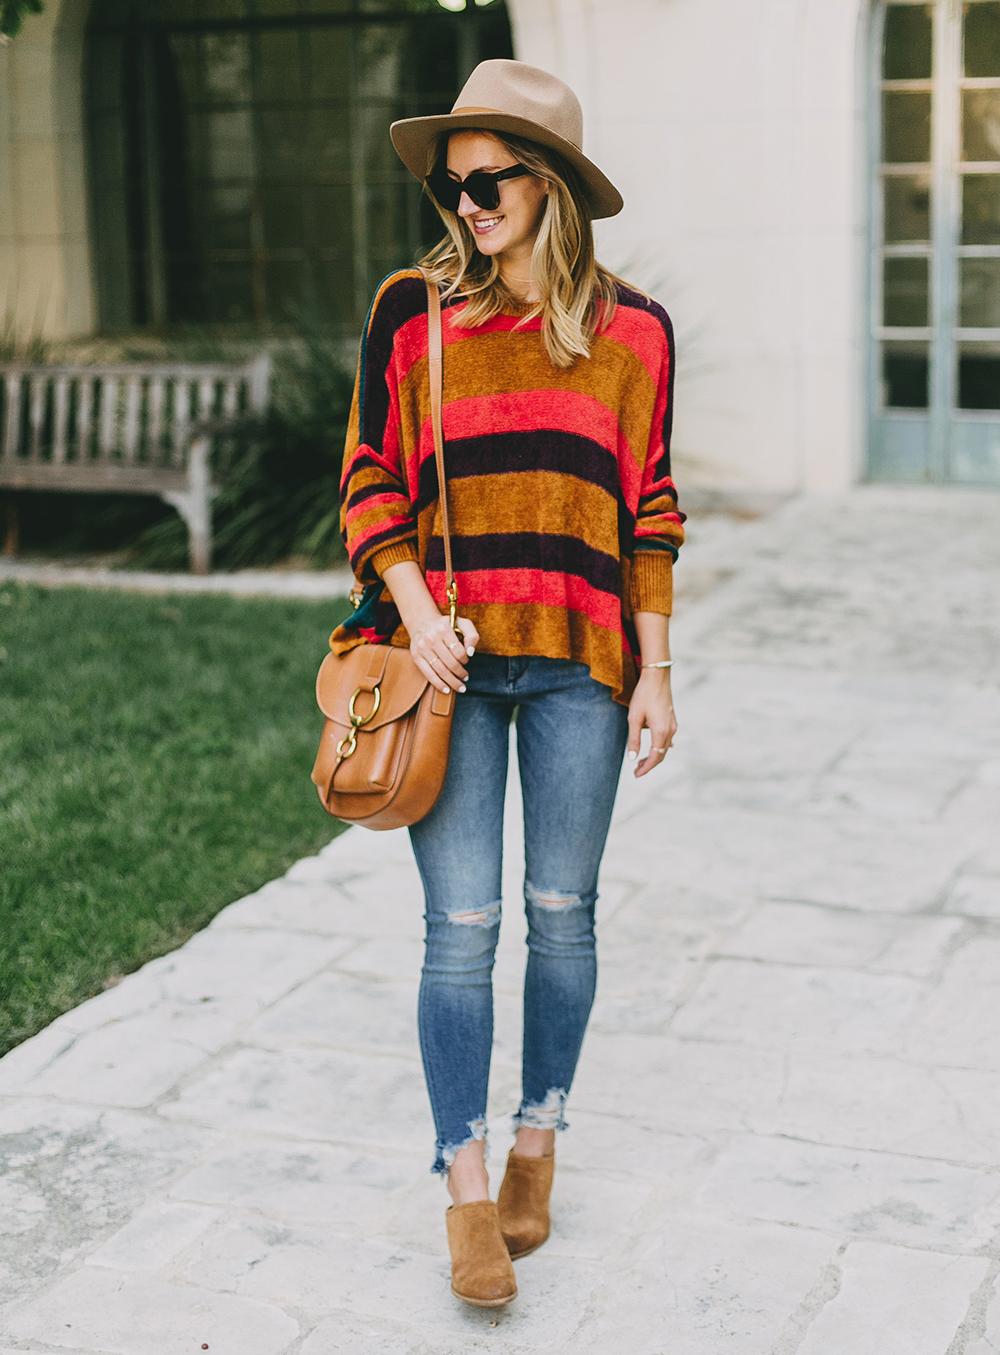 livvyland-blog-olivia-watson-austin-texas-fashion-blogger-free-people-oversize-striped-sweater-boho-chic-10